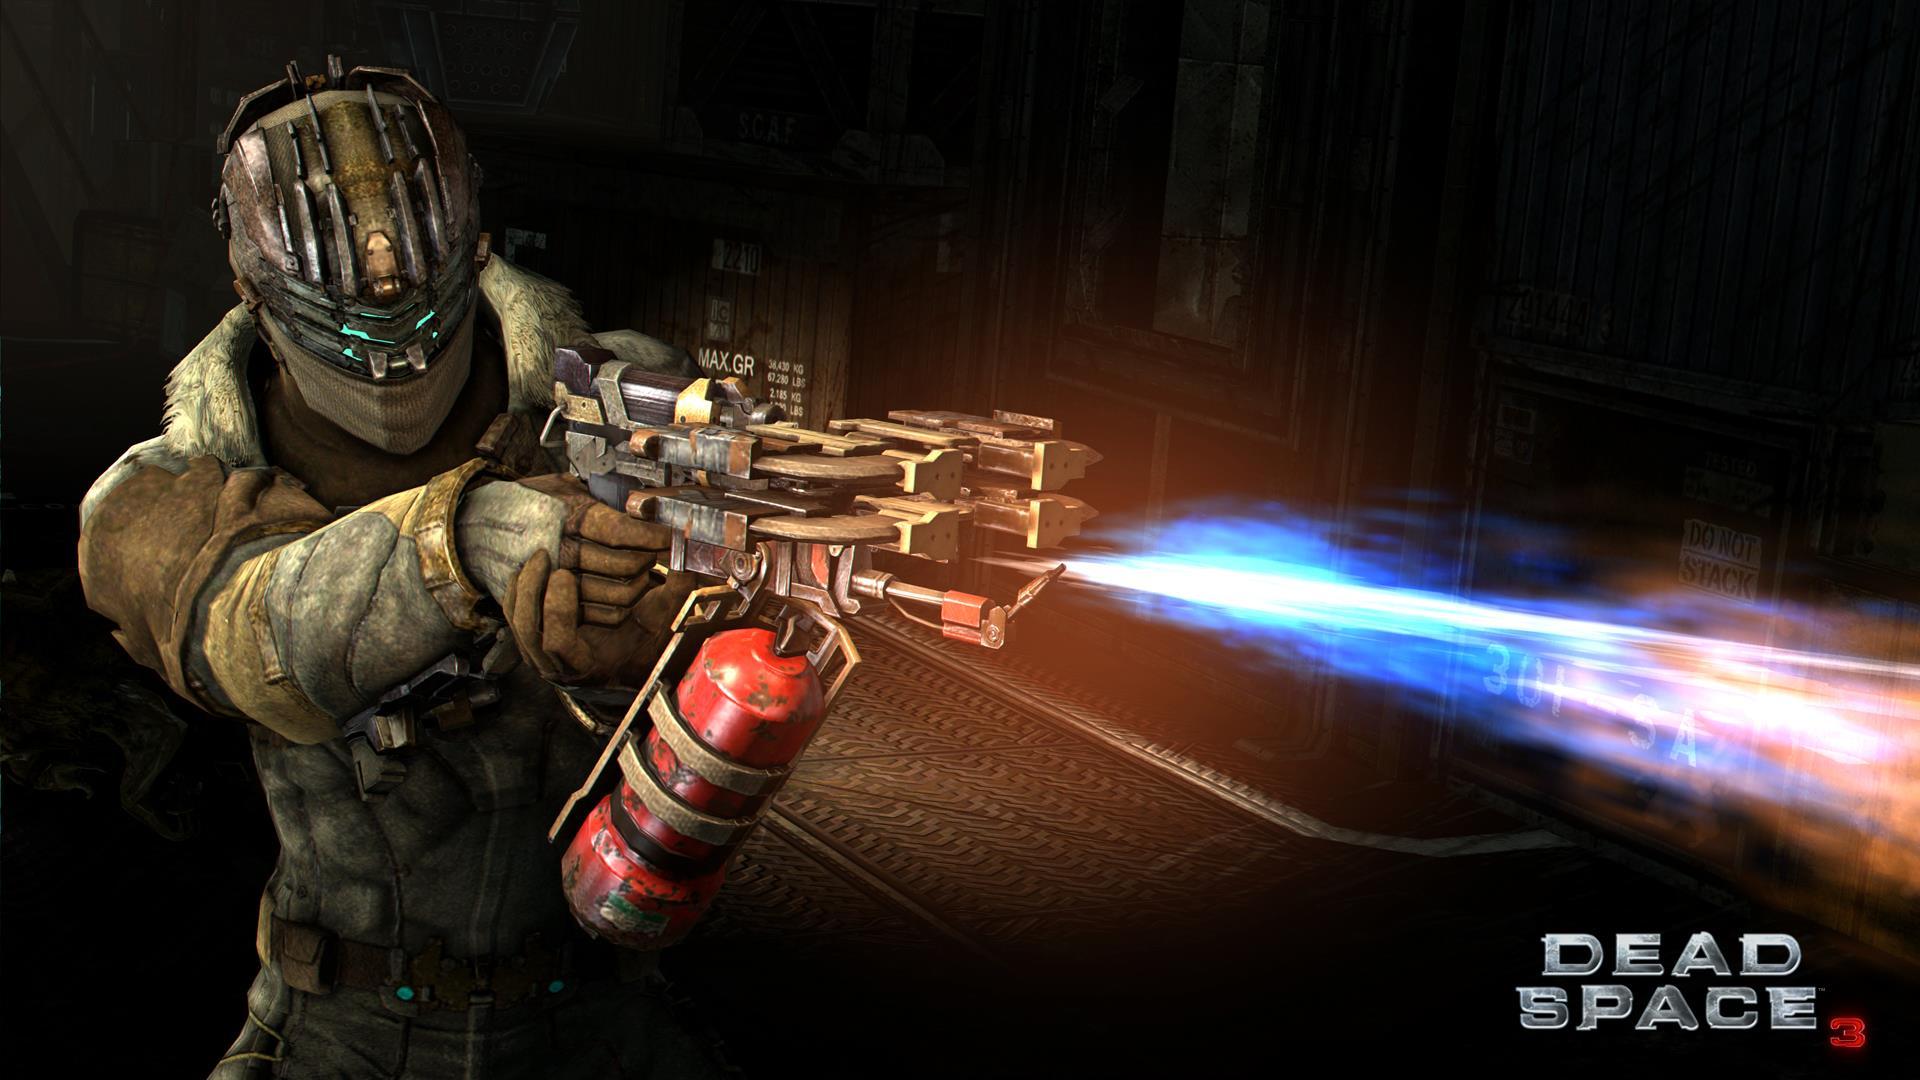 Dead space 3 blowtorch